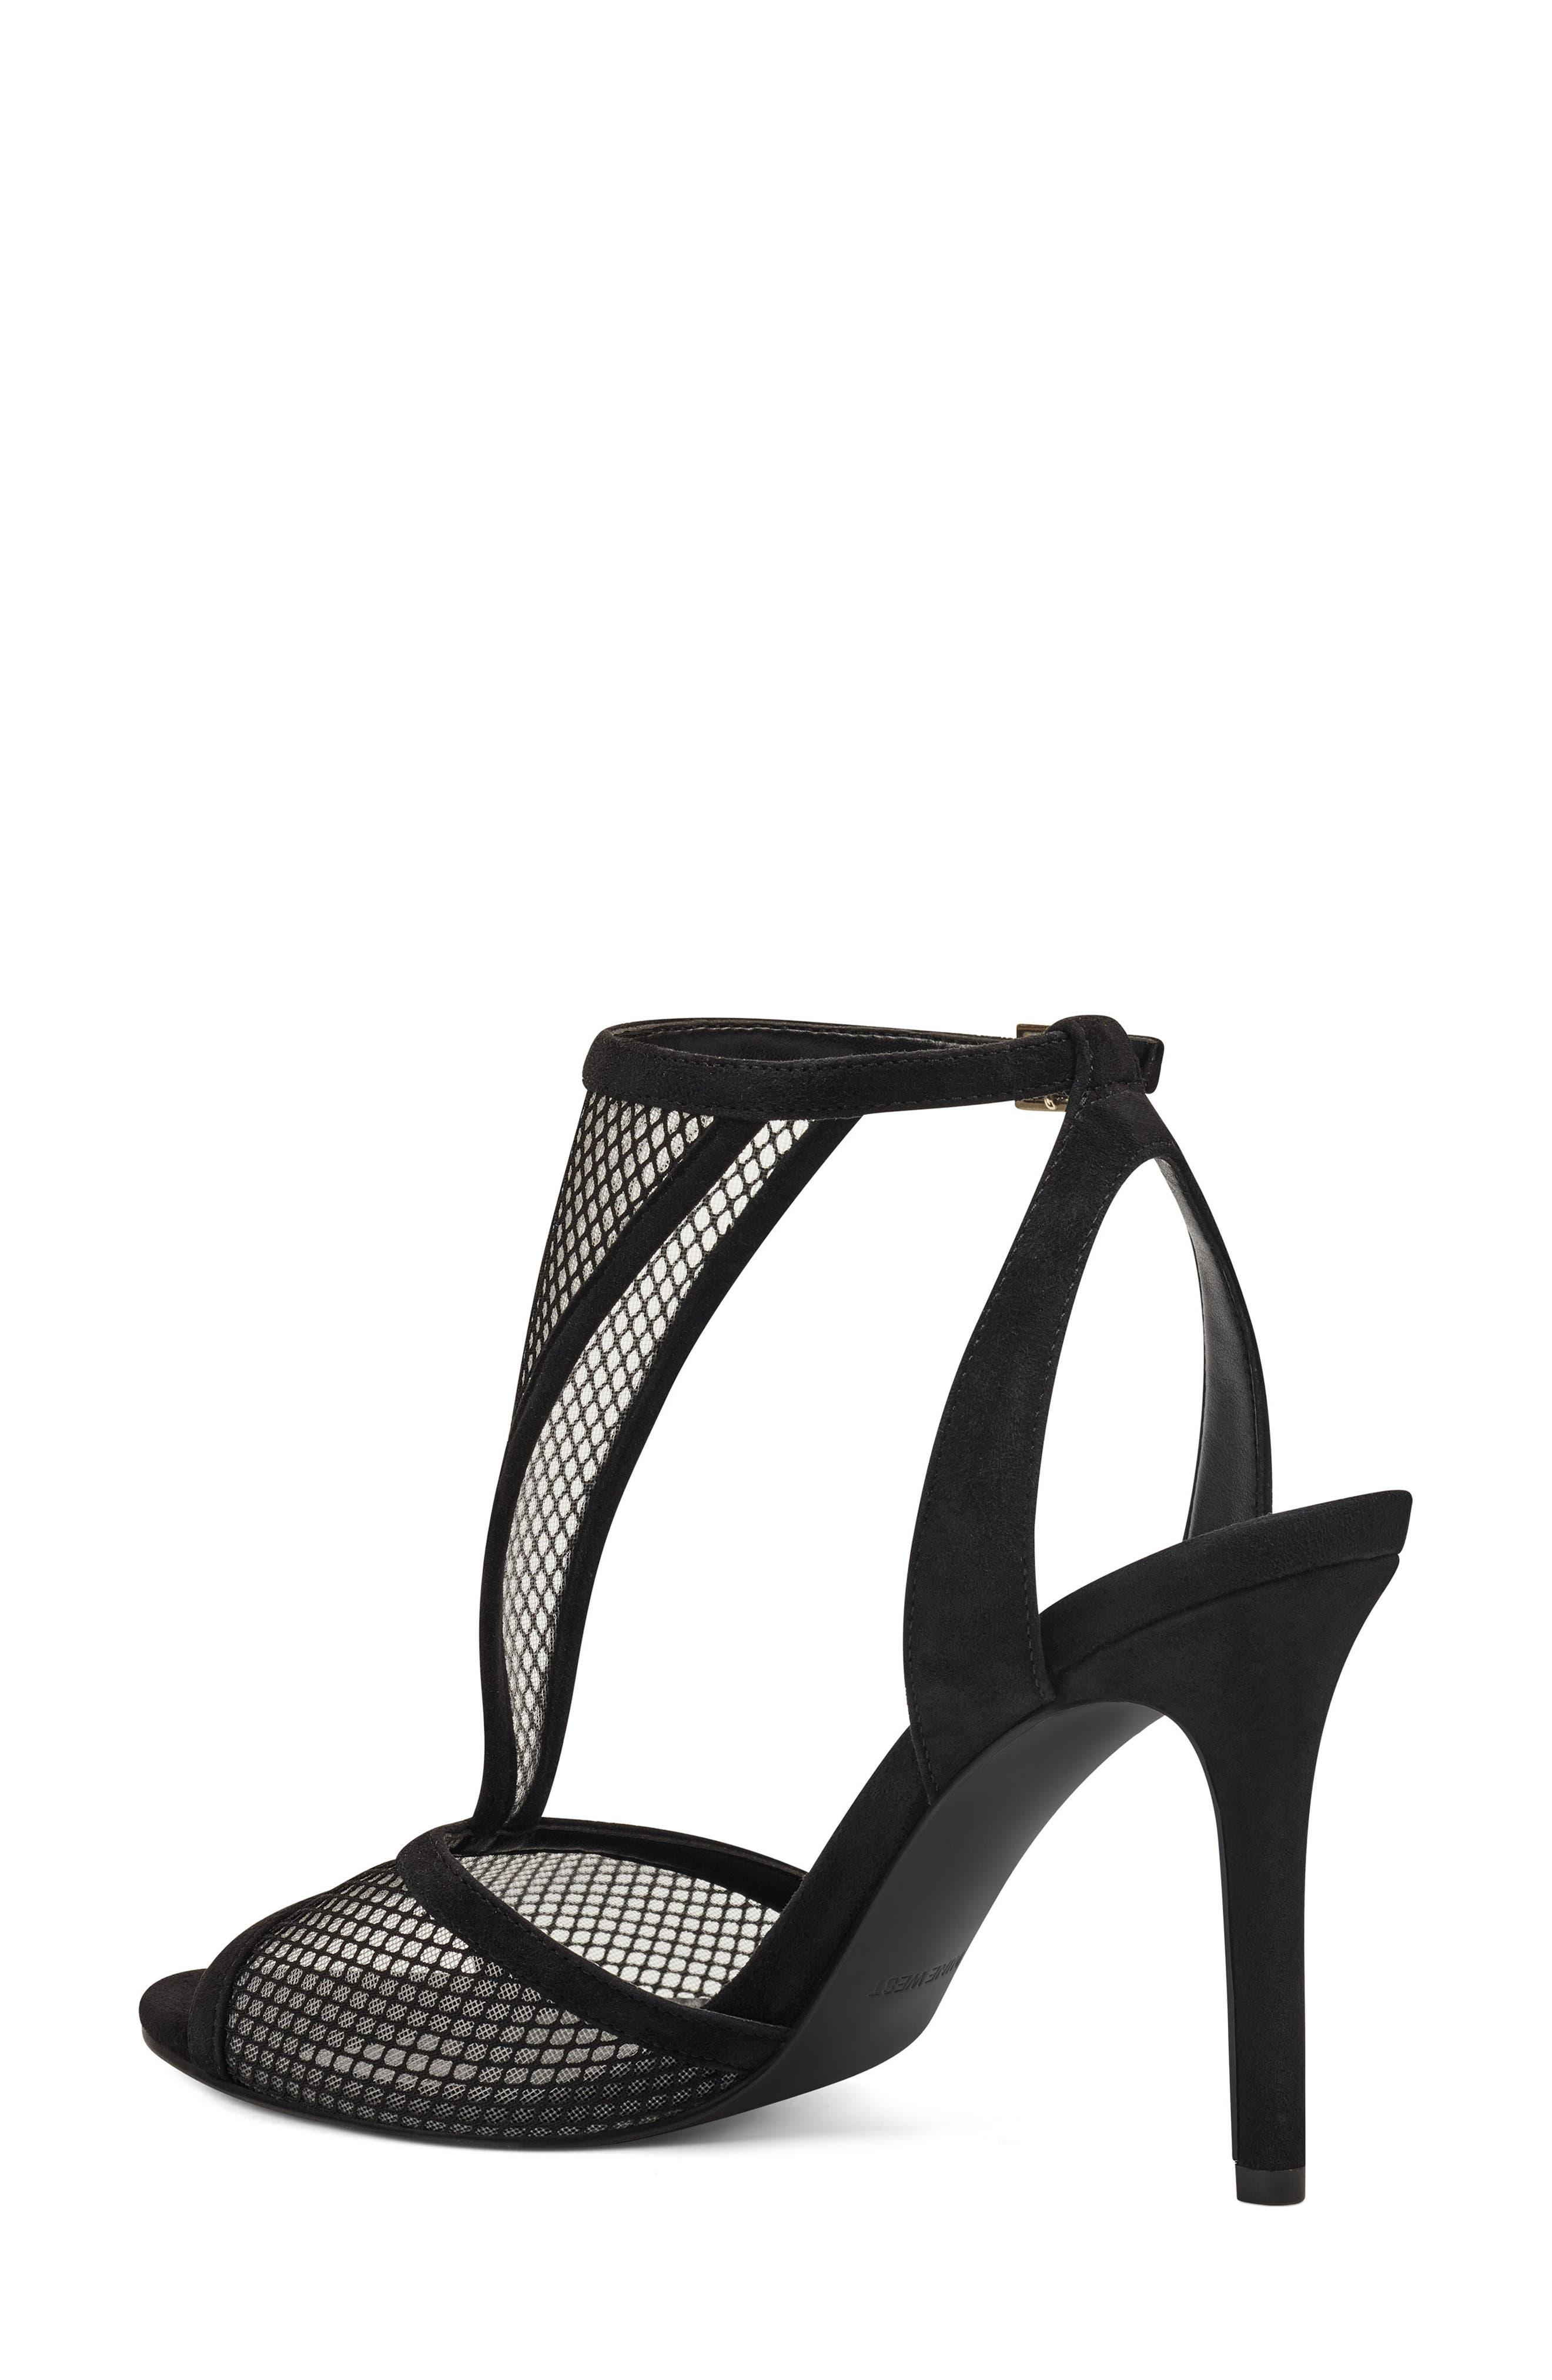 Manchon 2 Ankle Strap Sandal,                             Alternate thumbnail 2, color,                             BLACK STRETCH MESH/ LEATHER